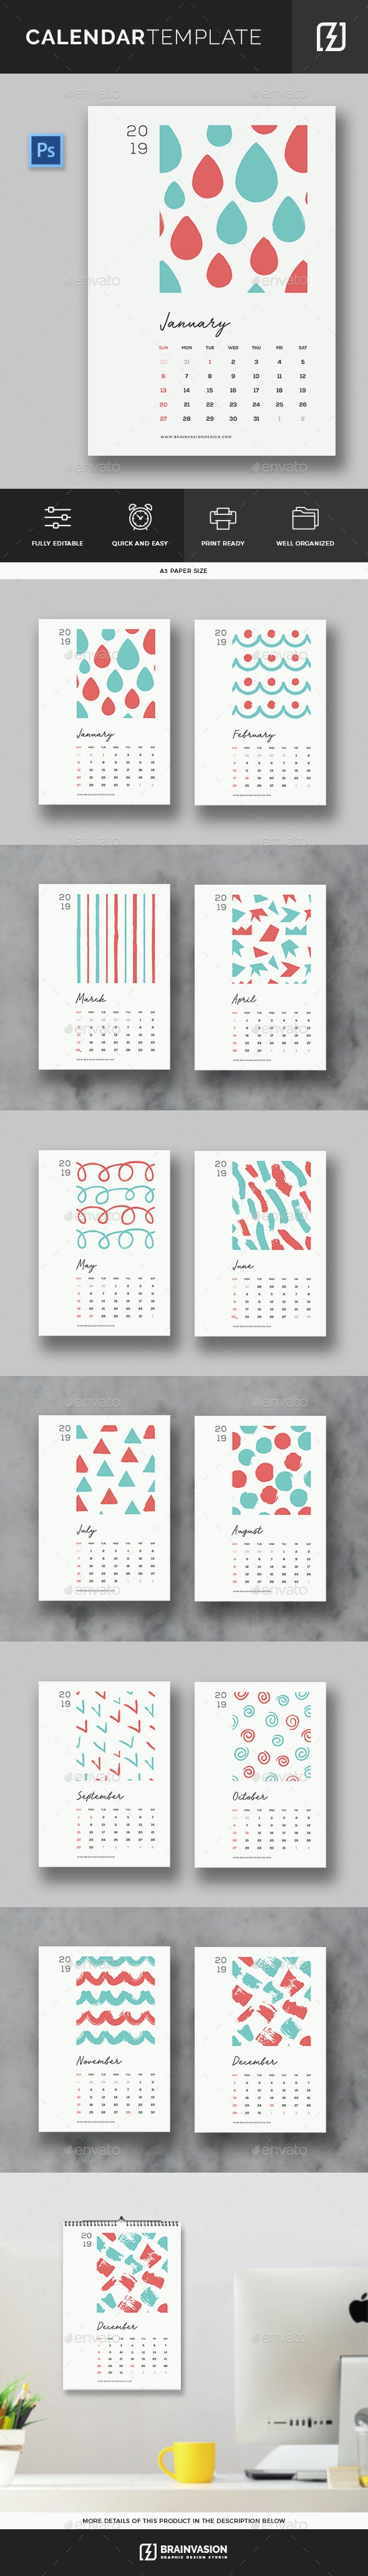 2019 Calendar Template - Calendars Stationery